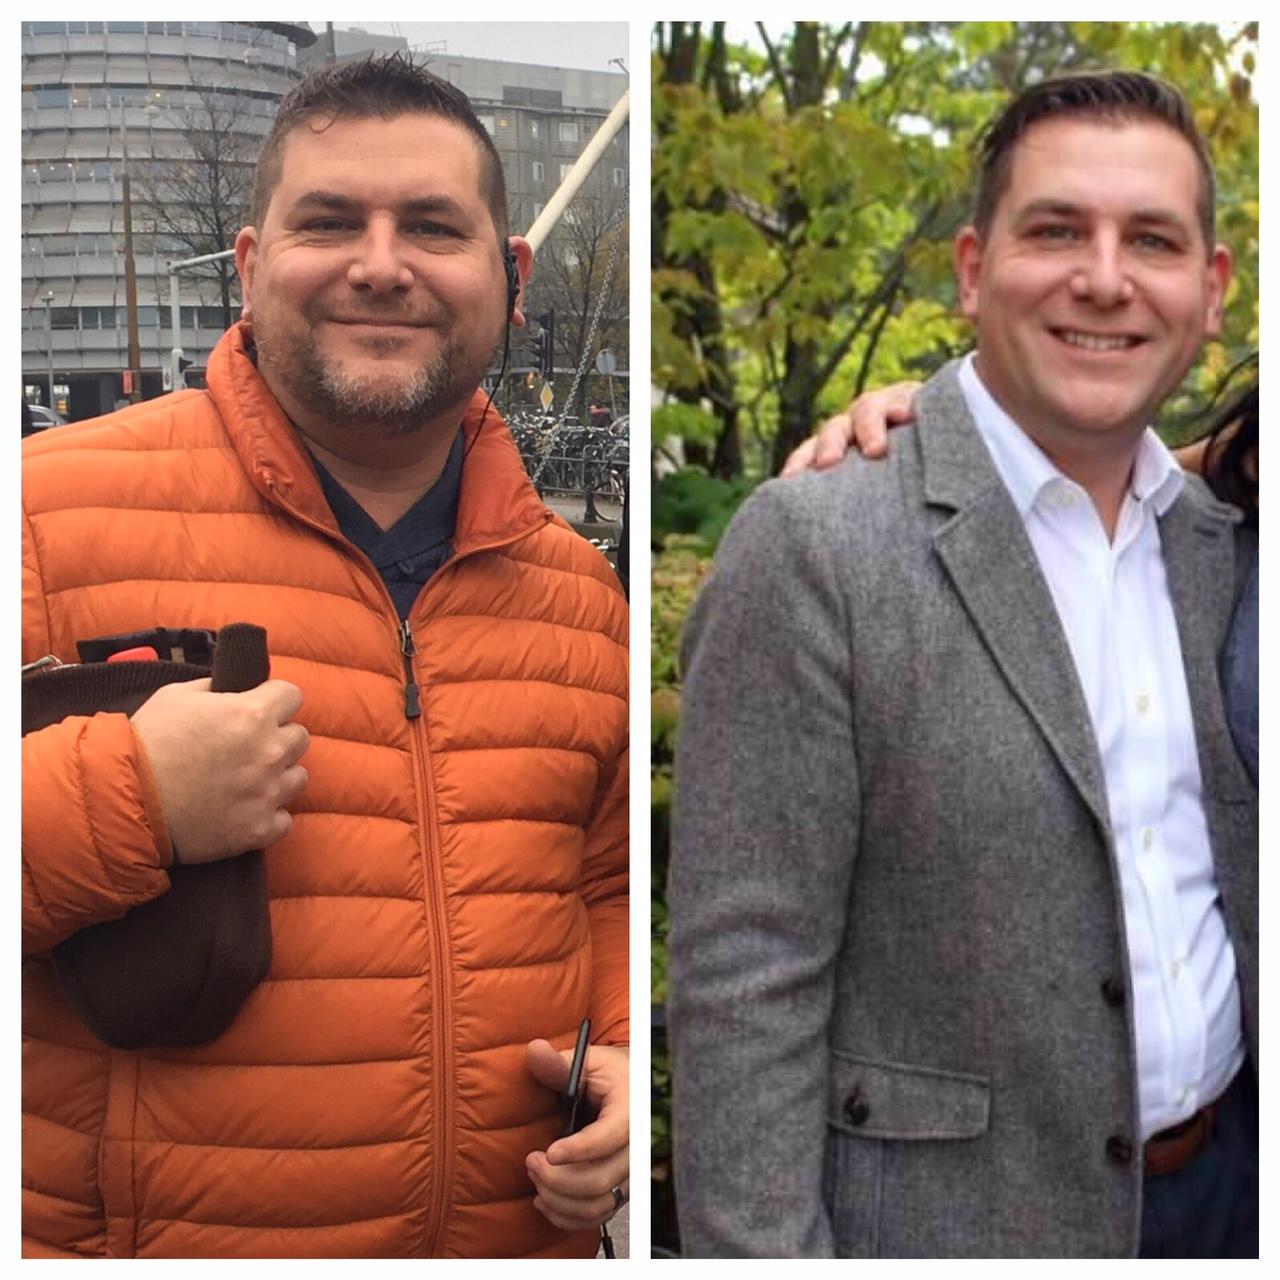 Fat November 2016 versus thin November 2017